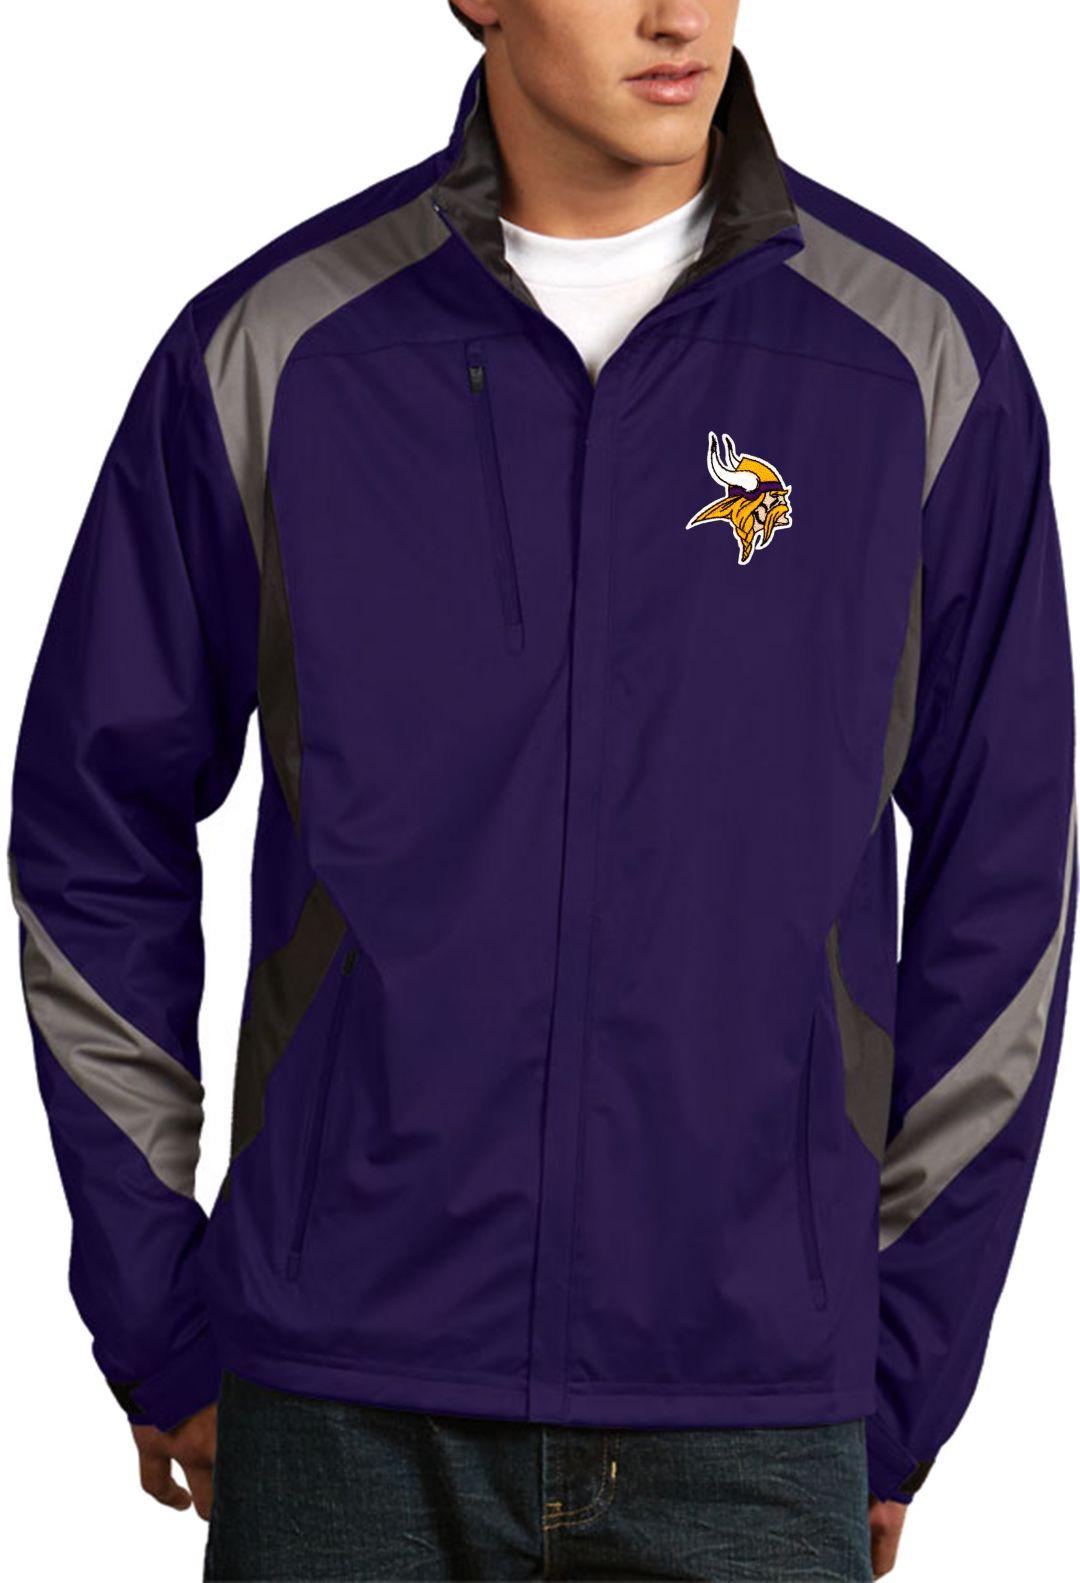 new product ca5a2 44b74 Antigua Men's Minnesota Vikings Tempest Purple Full-Zip Jacket